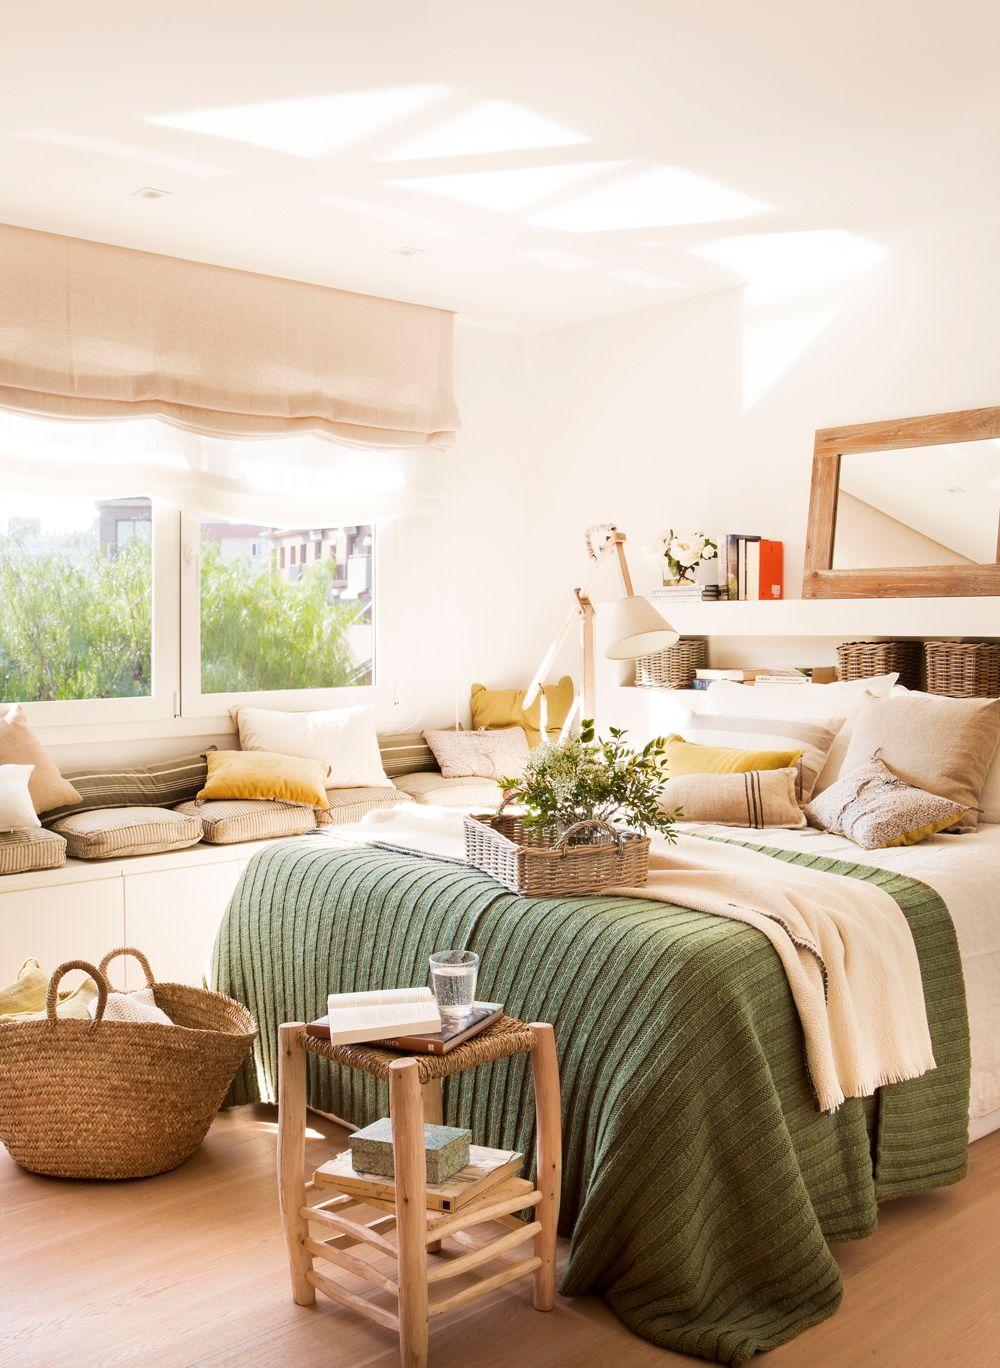 Dormitorio con cabecero tapizado, ropa de cama de lana, madera ...